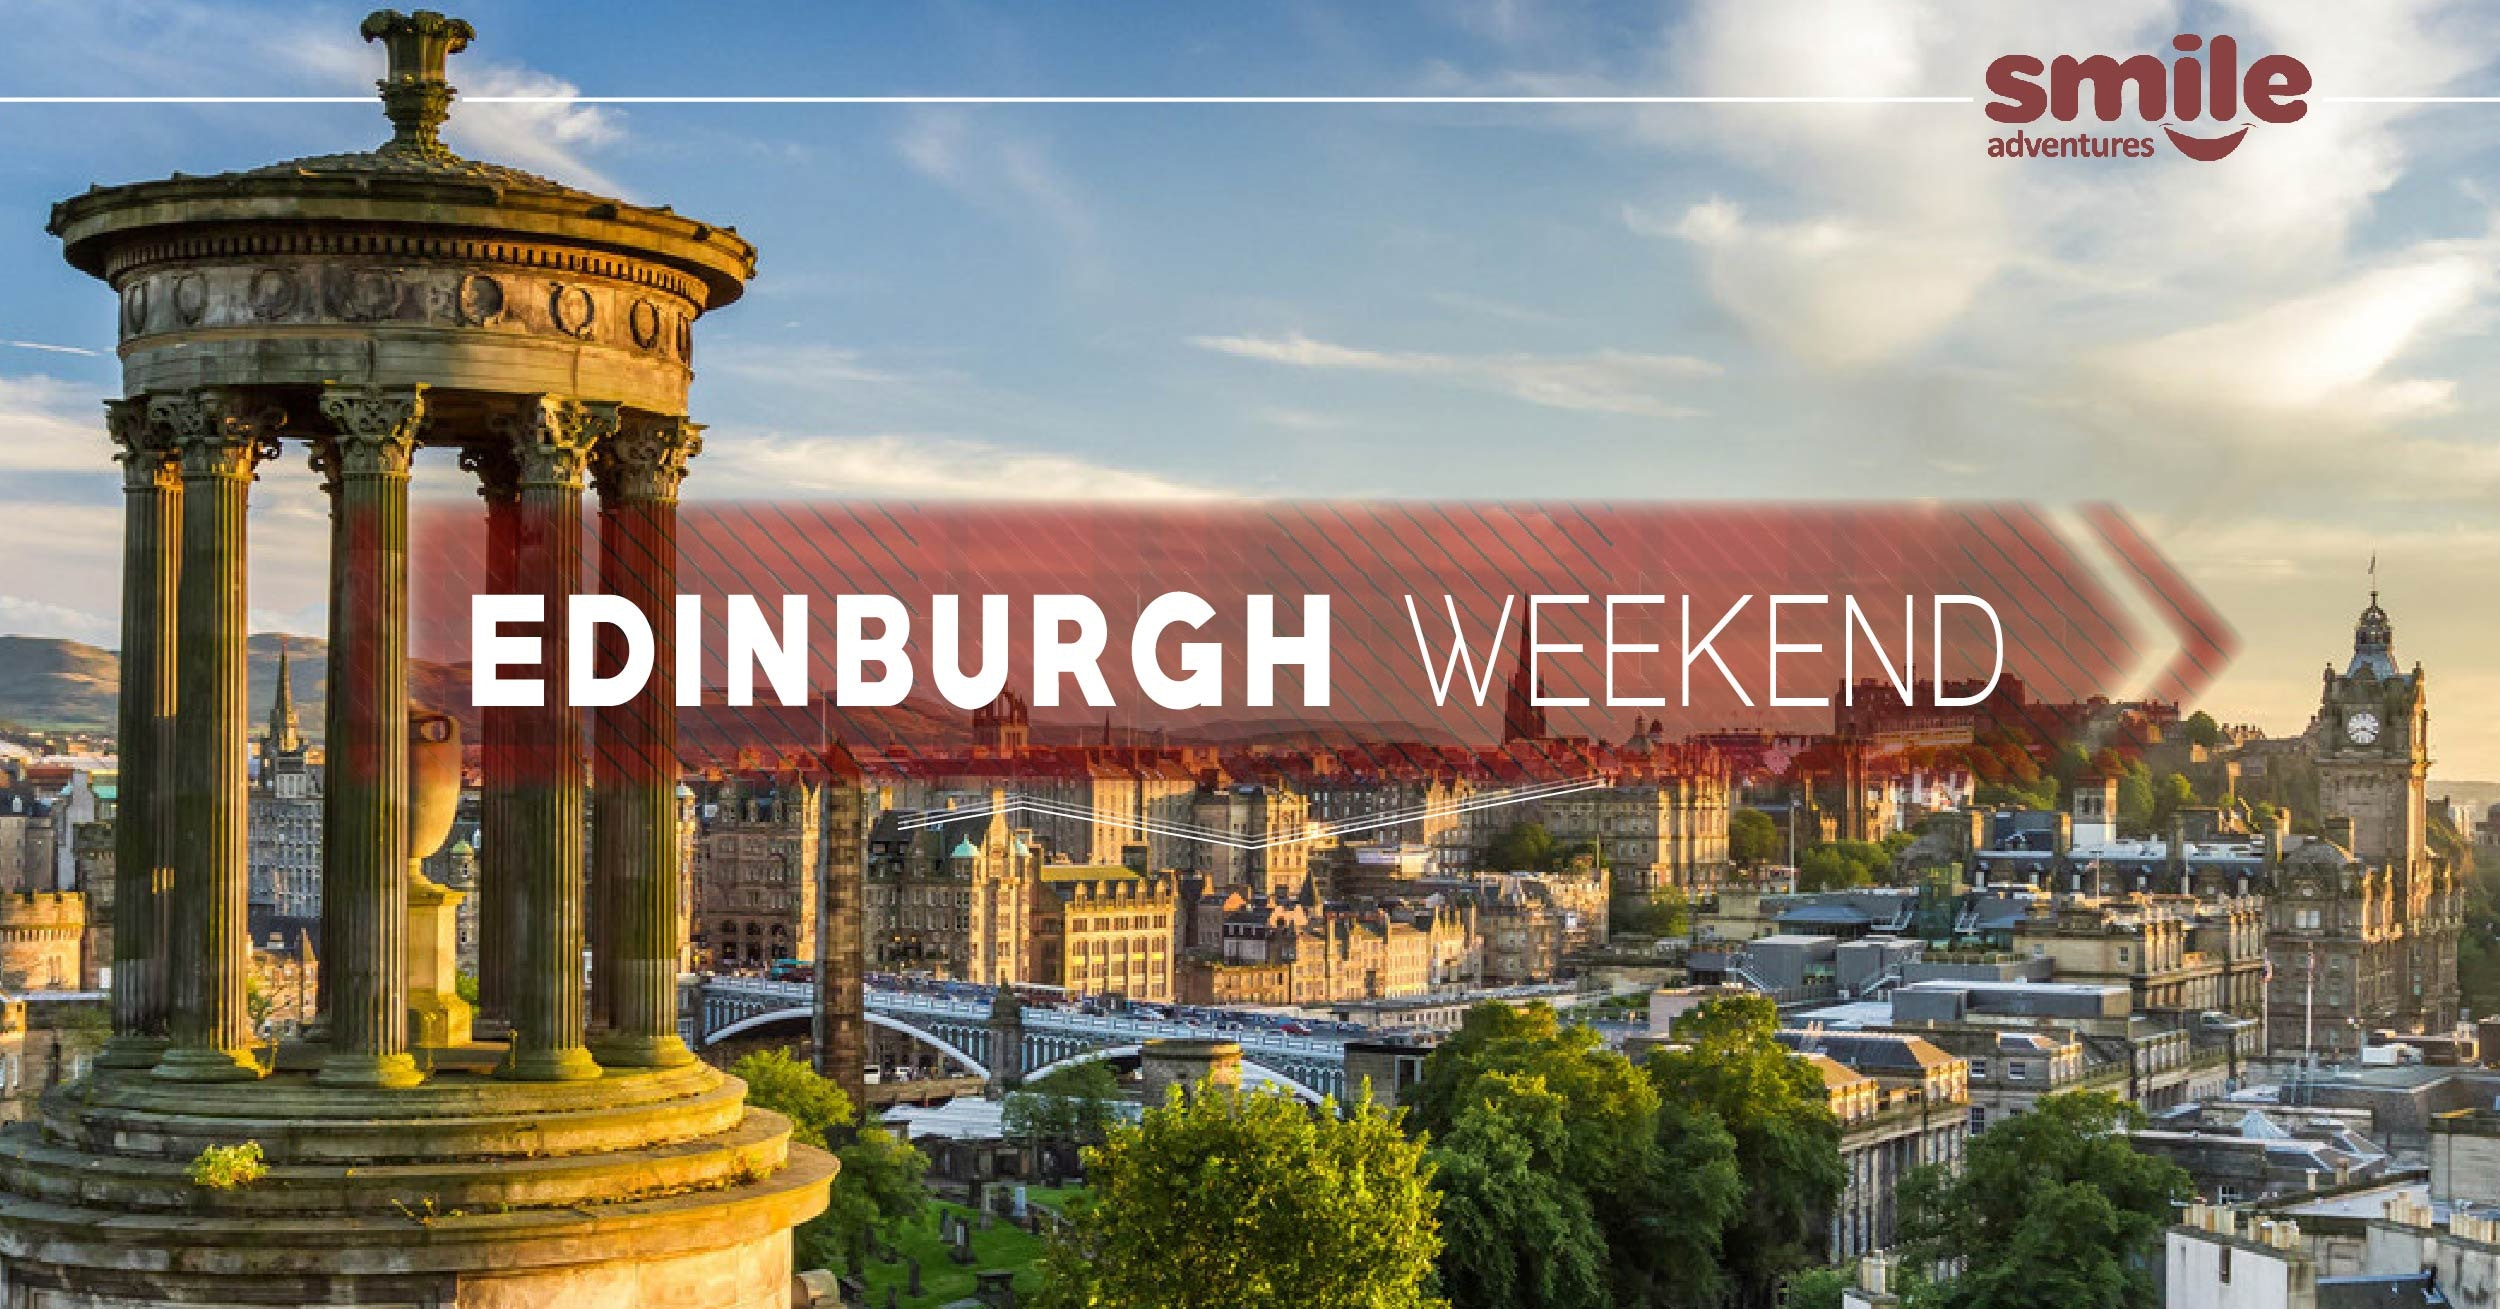 Edinburgh Weekend – From Manchester